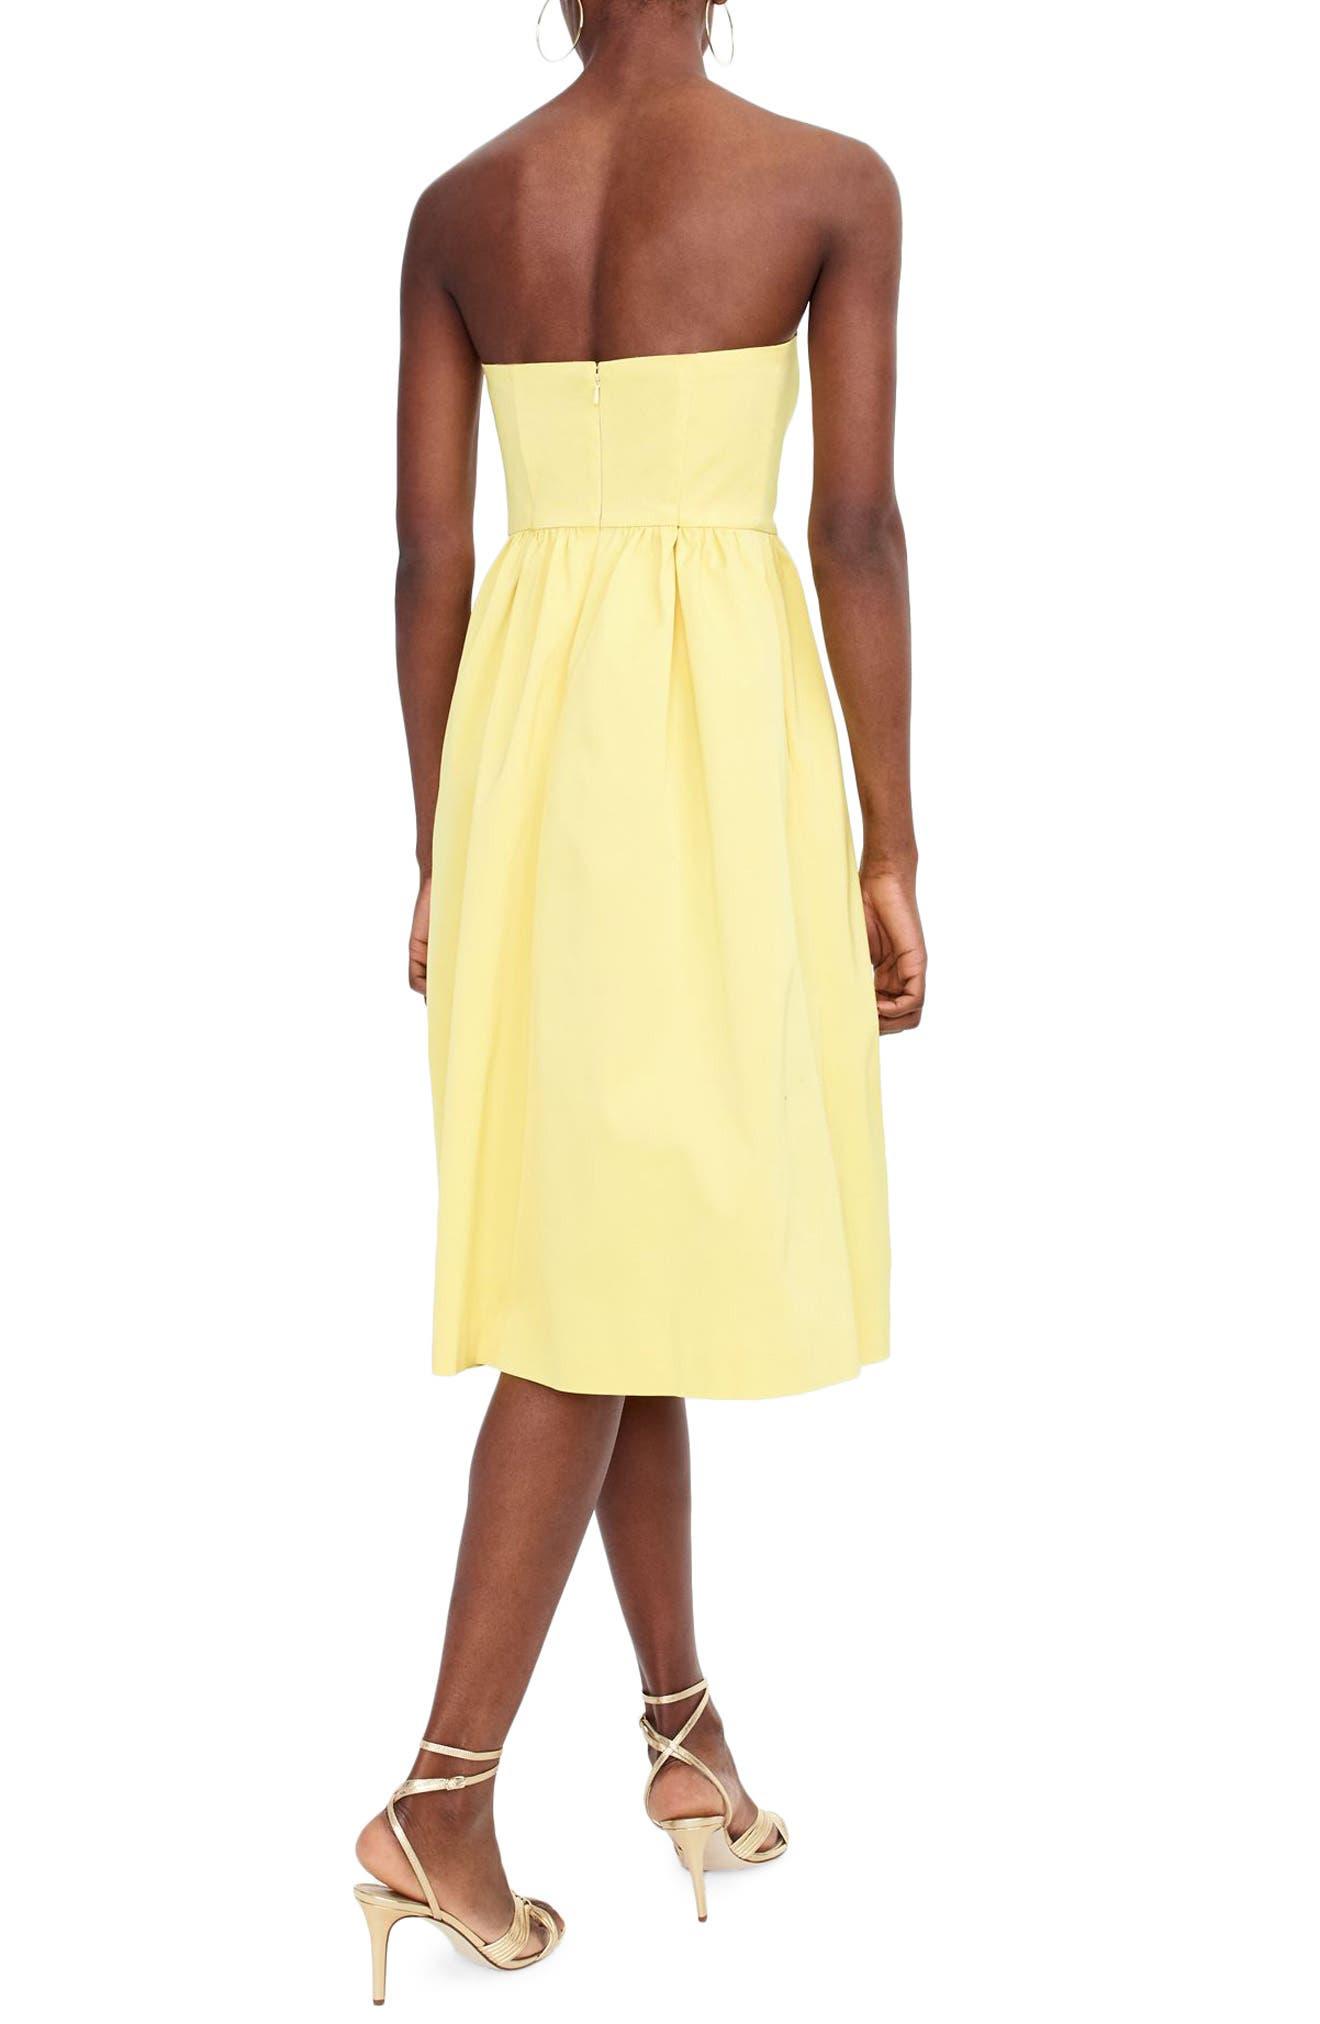 J.Crew Strapless Fit & Flare Dress,                             Alternate thumbnail 3, color,                             Bright Lemon